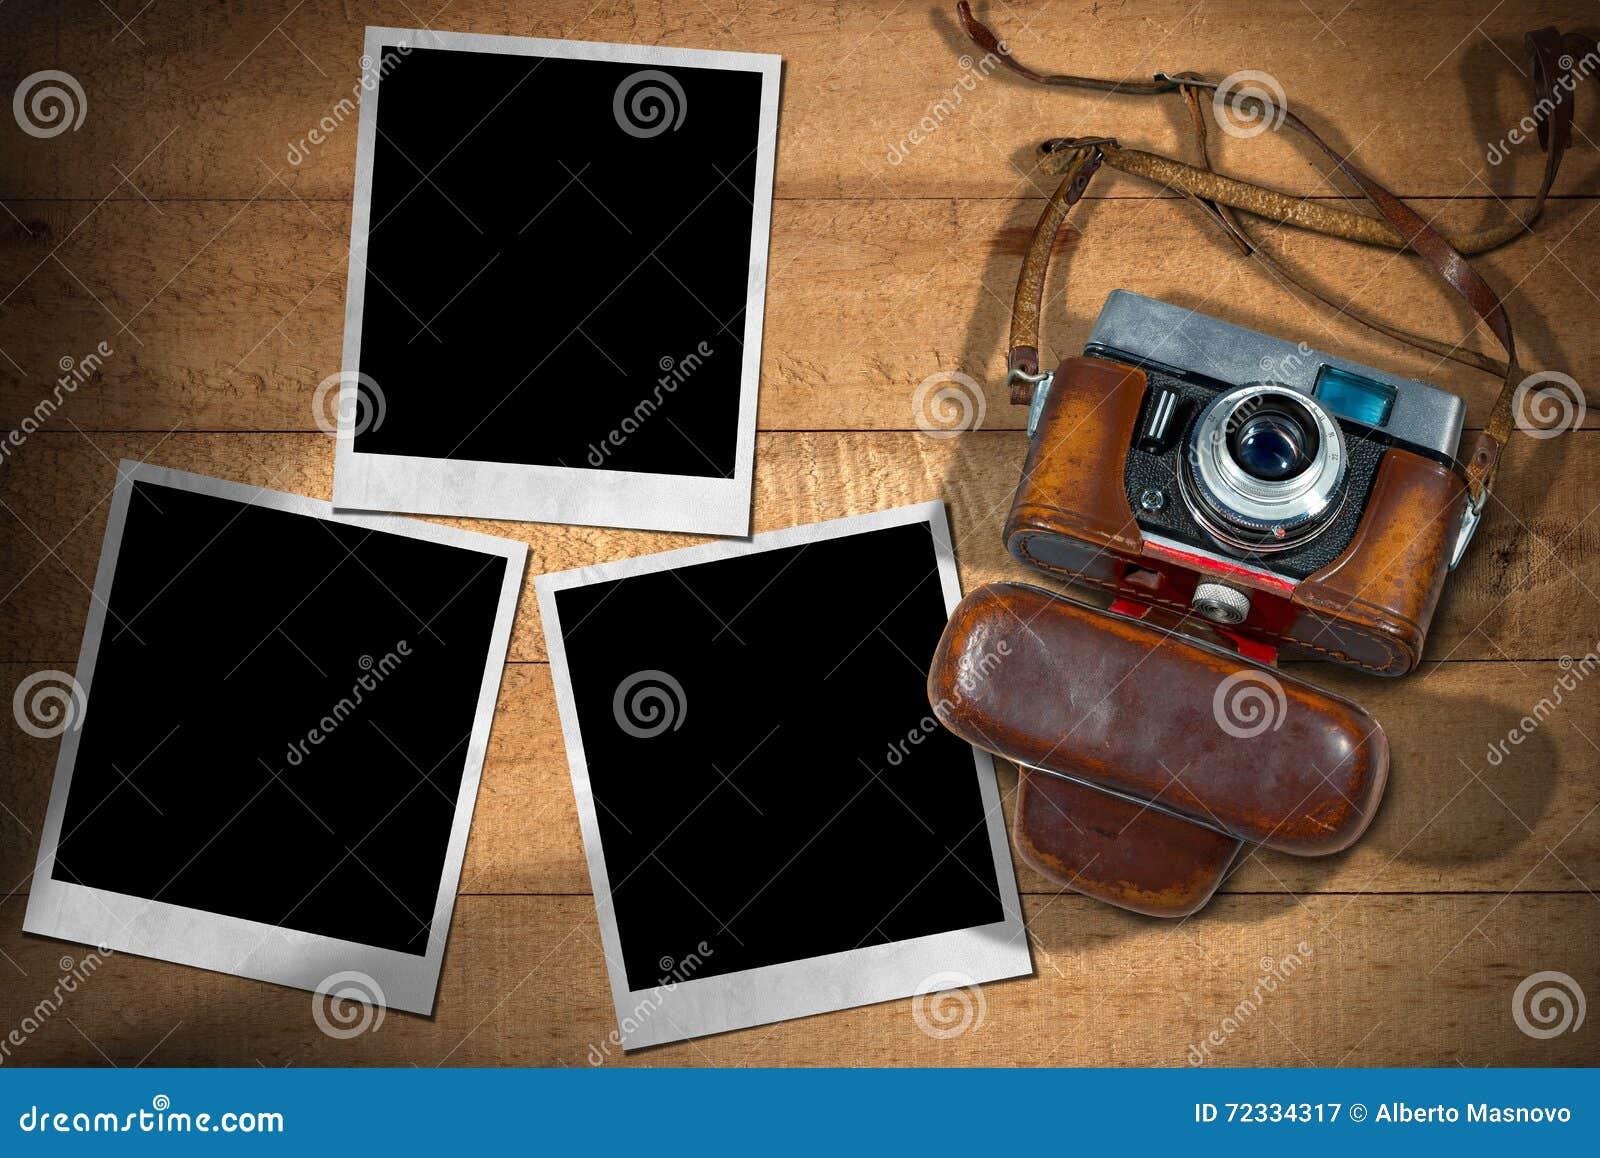 Alte Kamera und sofortige Foto-Rahmen